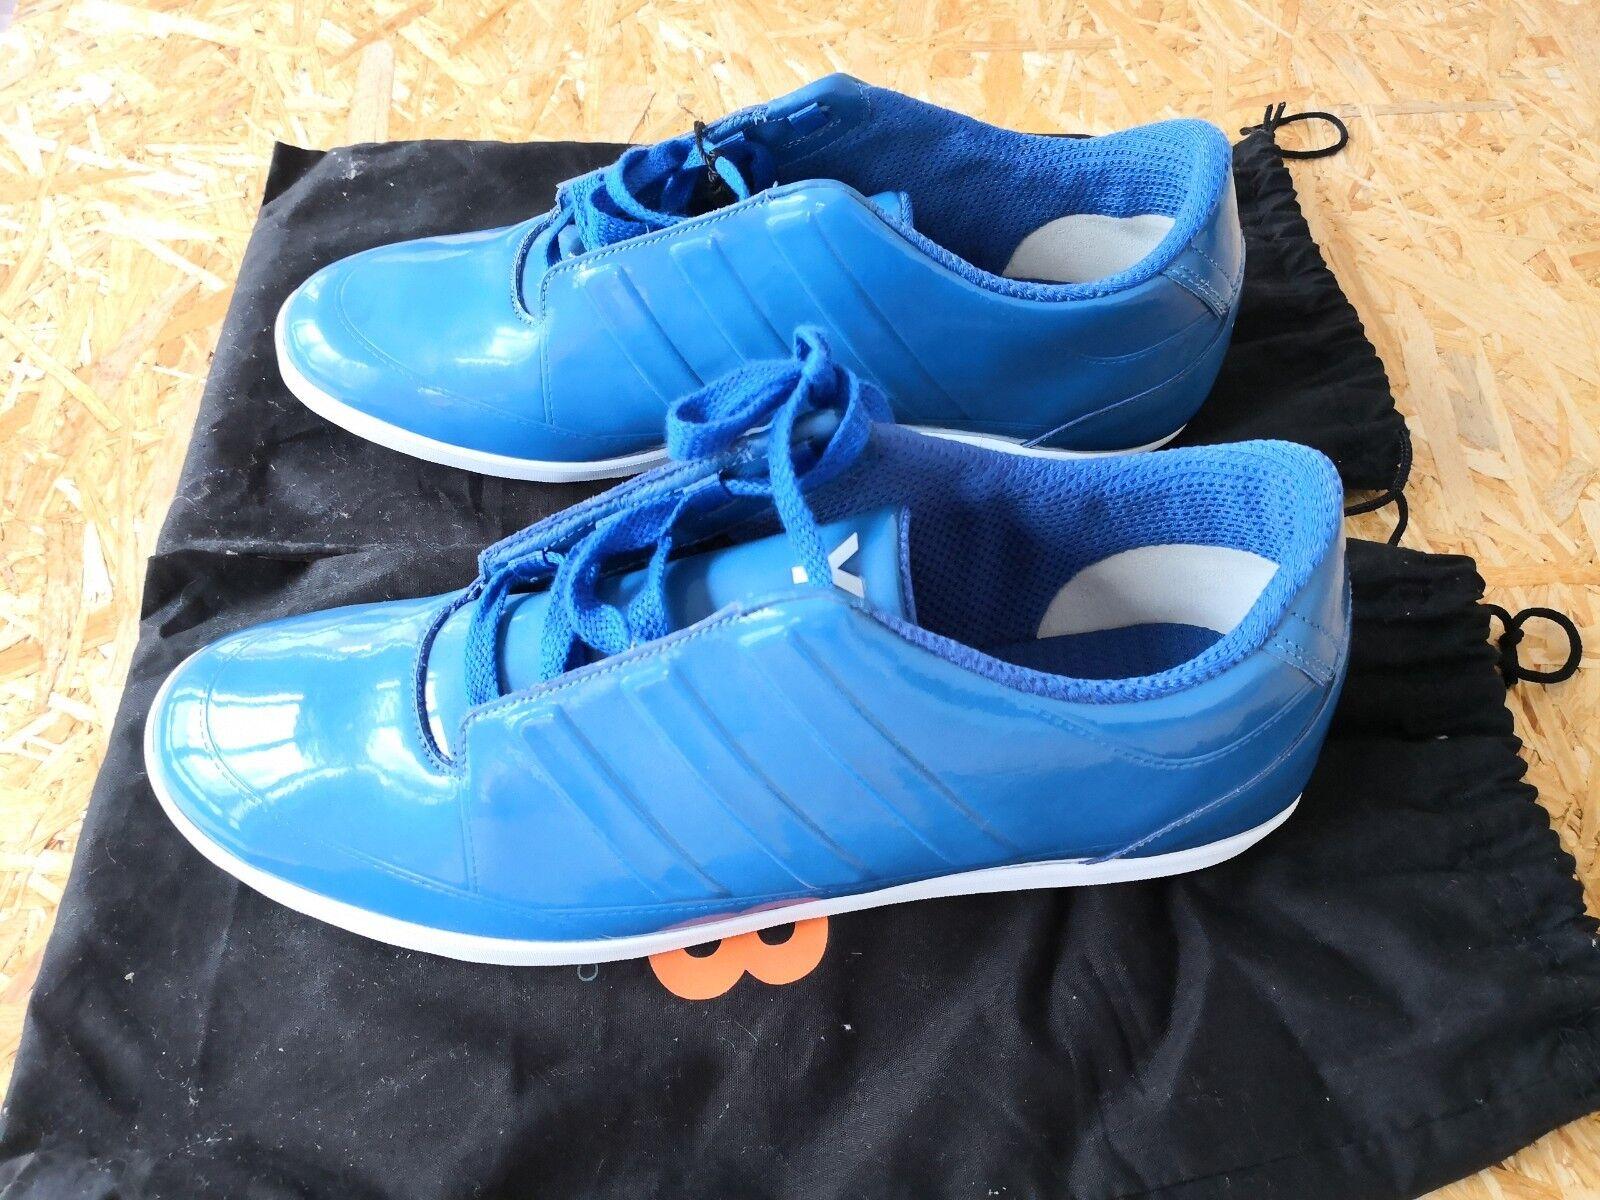 Adidas Y3 Honja low blue Y-3 sneaker neu sehr selten